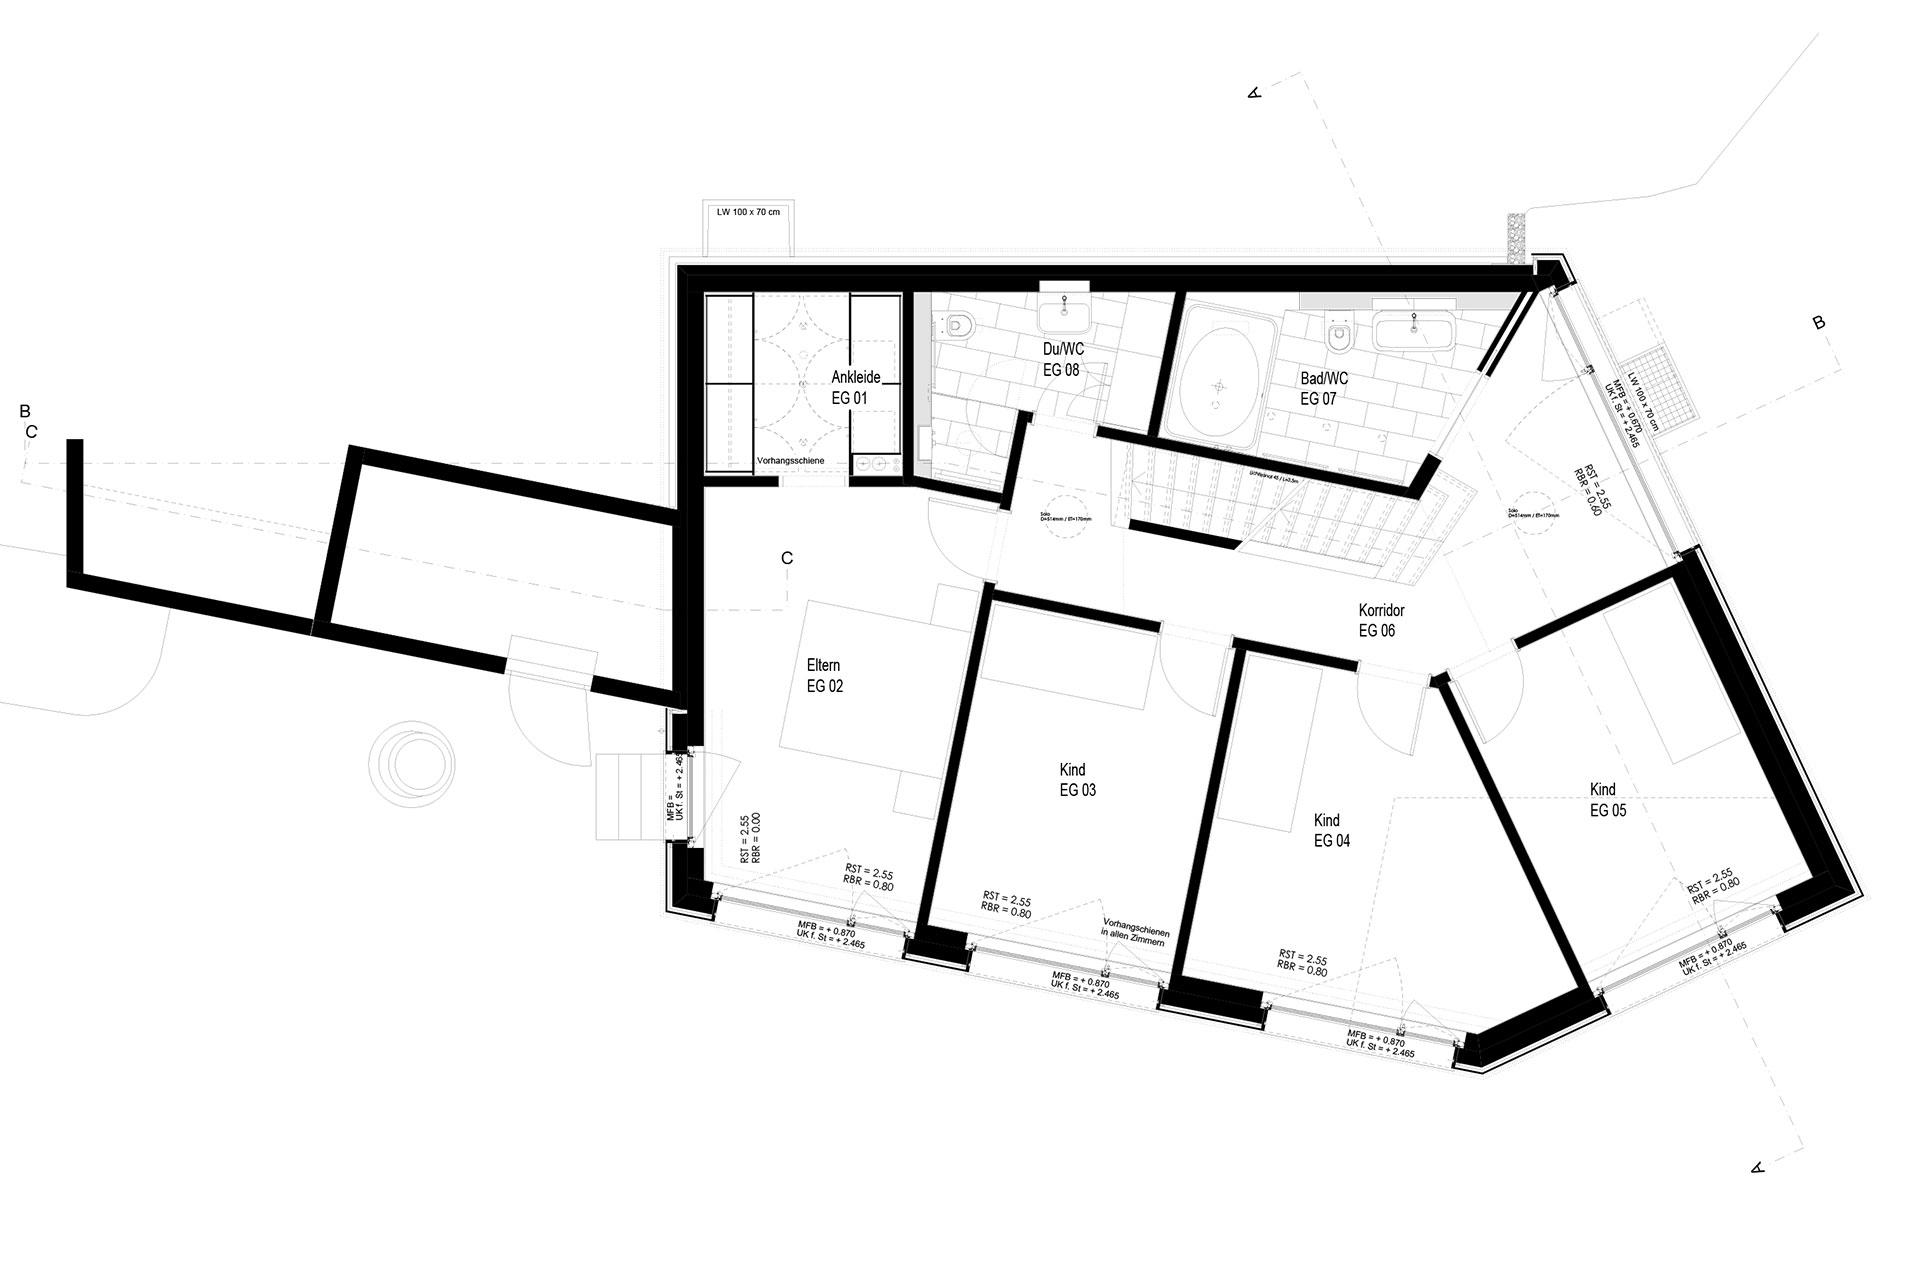 1305-KRWI-Werkplan-EG-sw